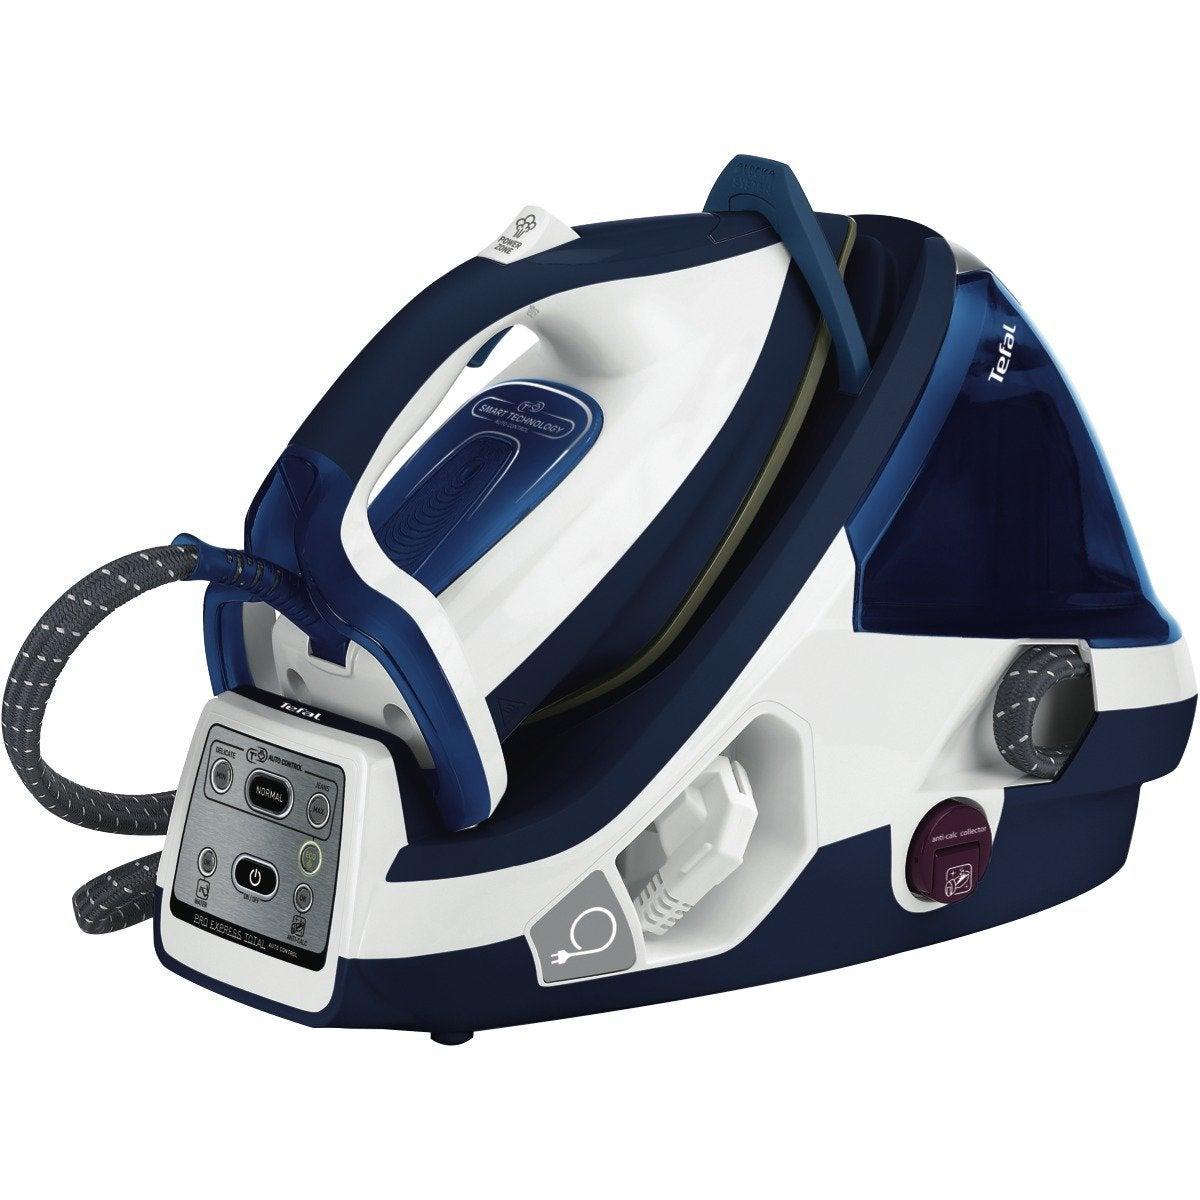 Tefal GV9060 Iron